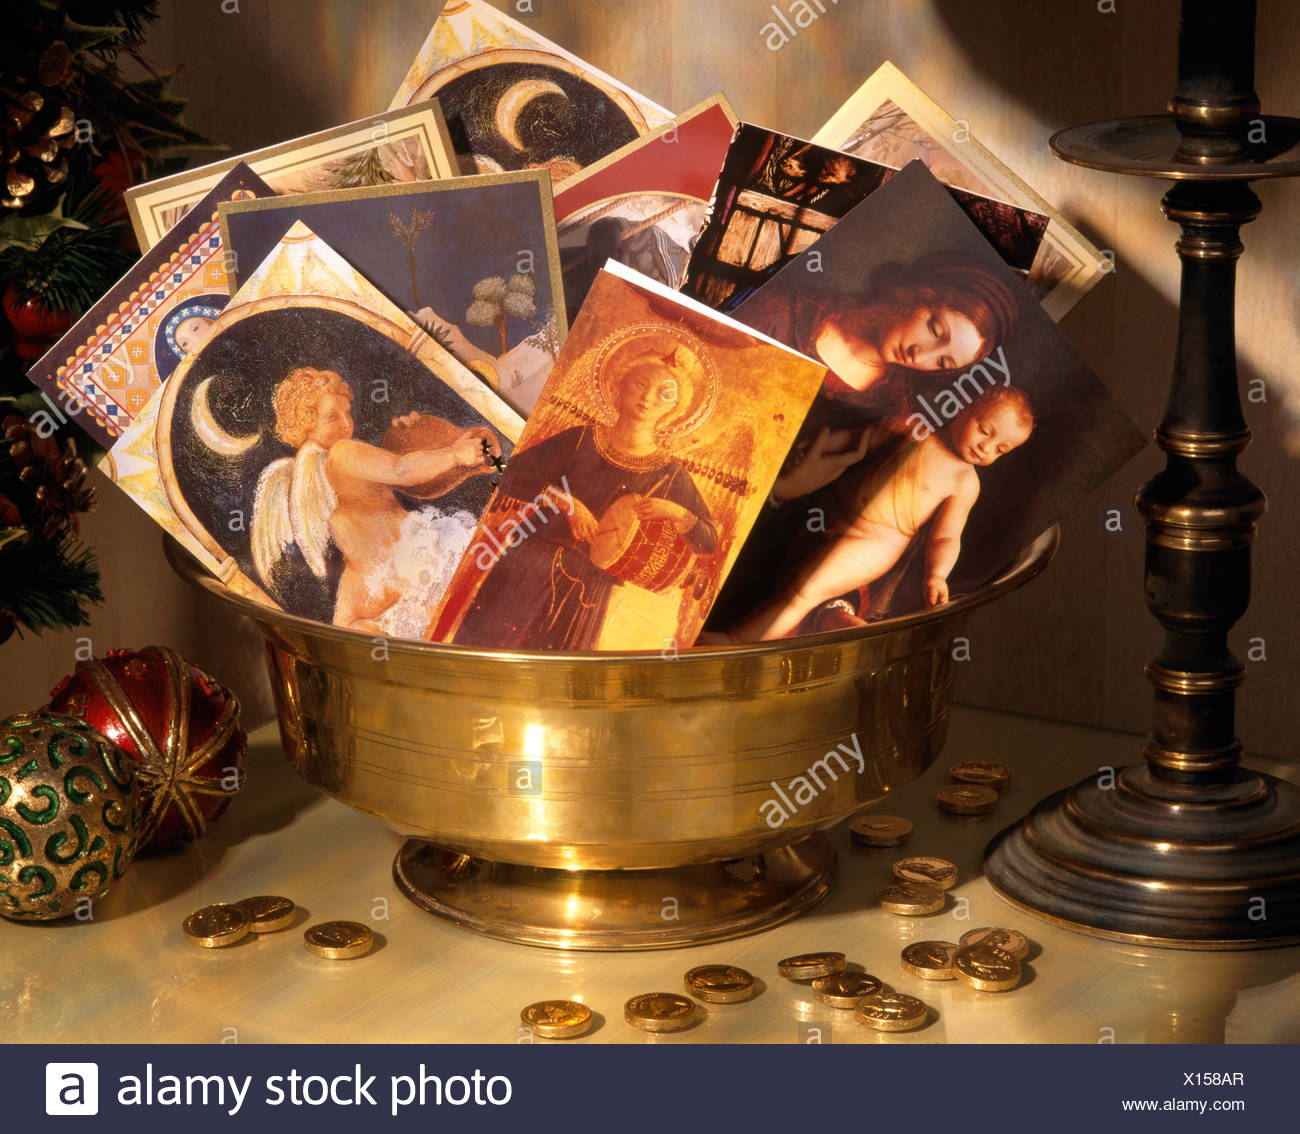 Religious Christmas Cards Stock Photos Religious Christmas Cards